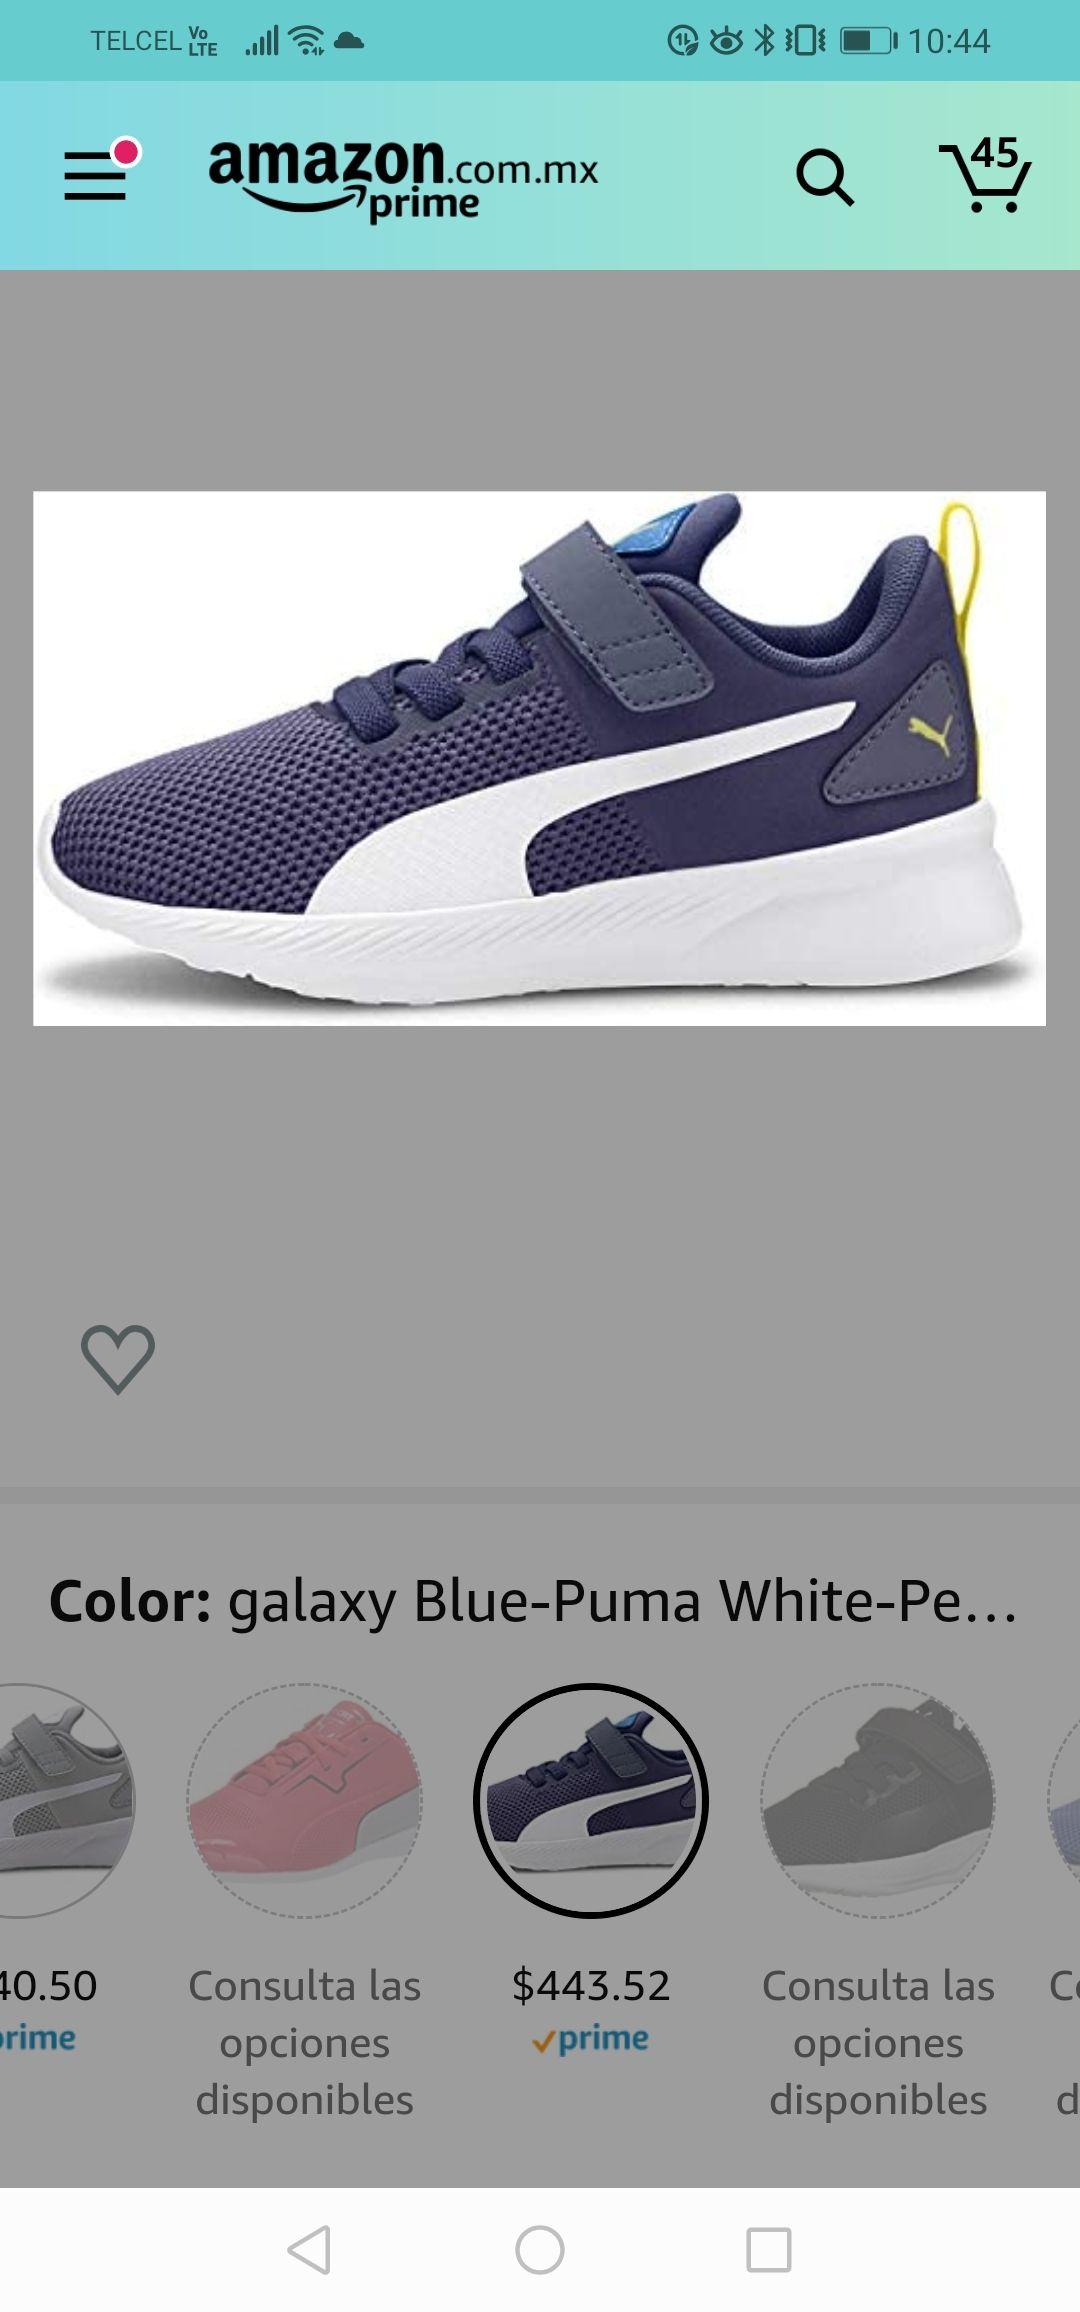 Amazon: PUMA Flyer Runner Velcro Sneaker, Galaxy Blue